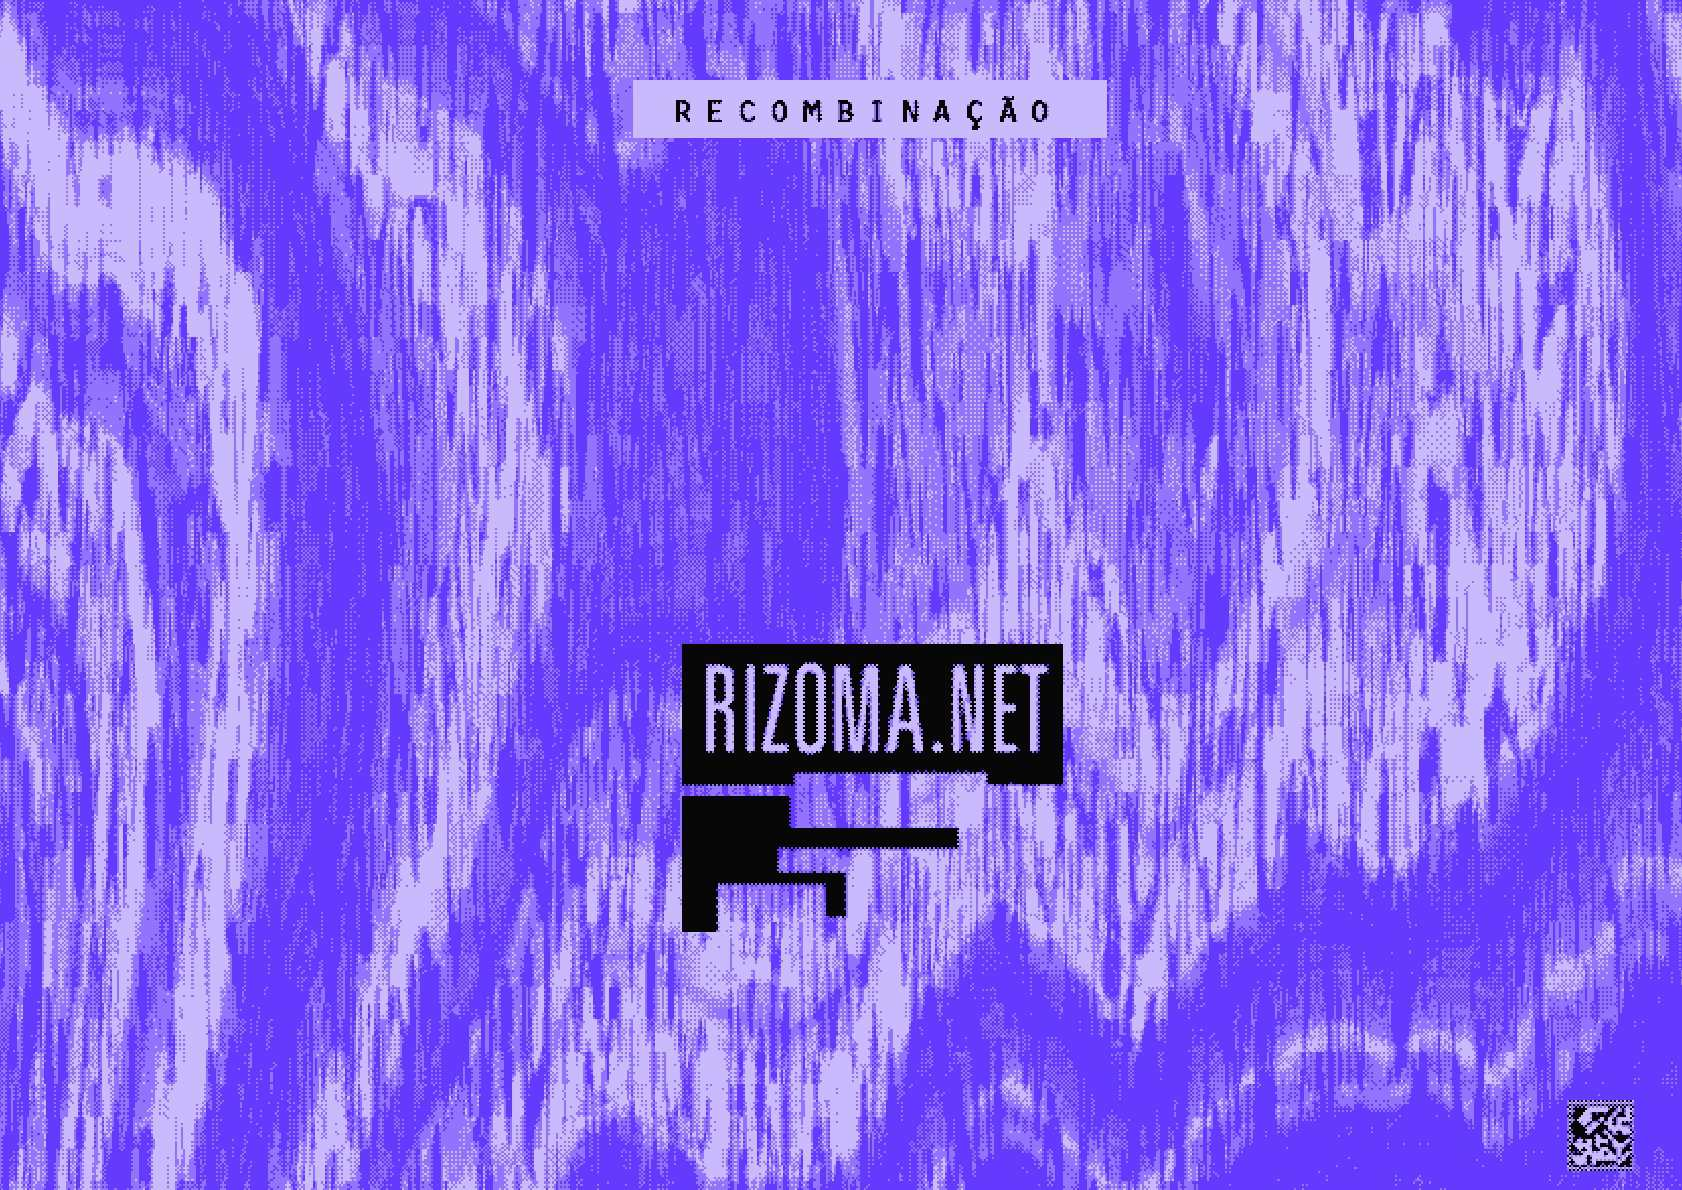 f9f77d32b7 Calaméo - RIZOMA.NET- Recombinação